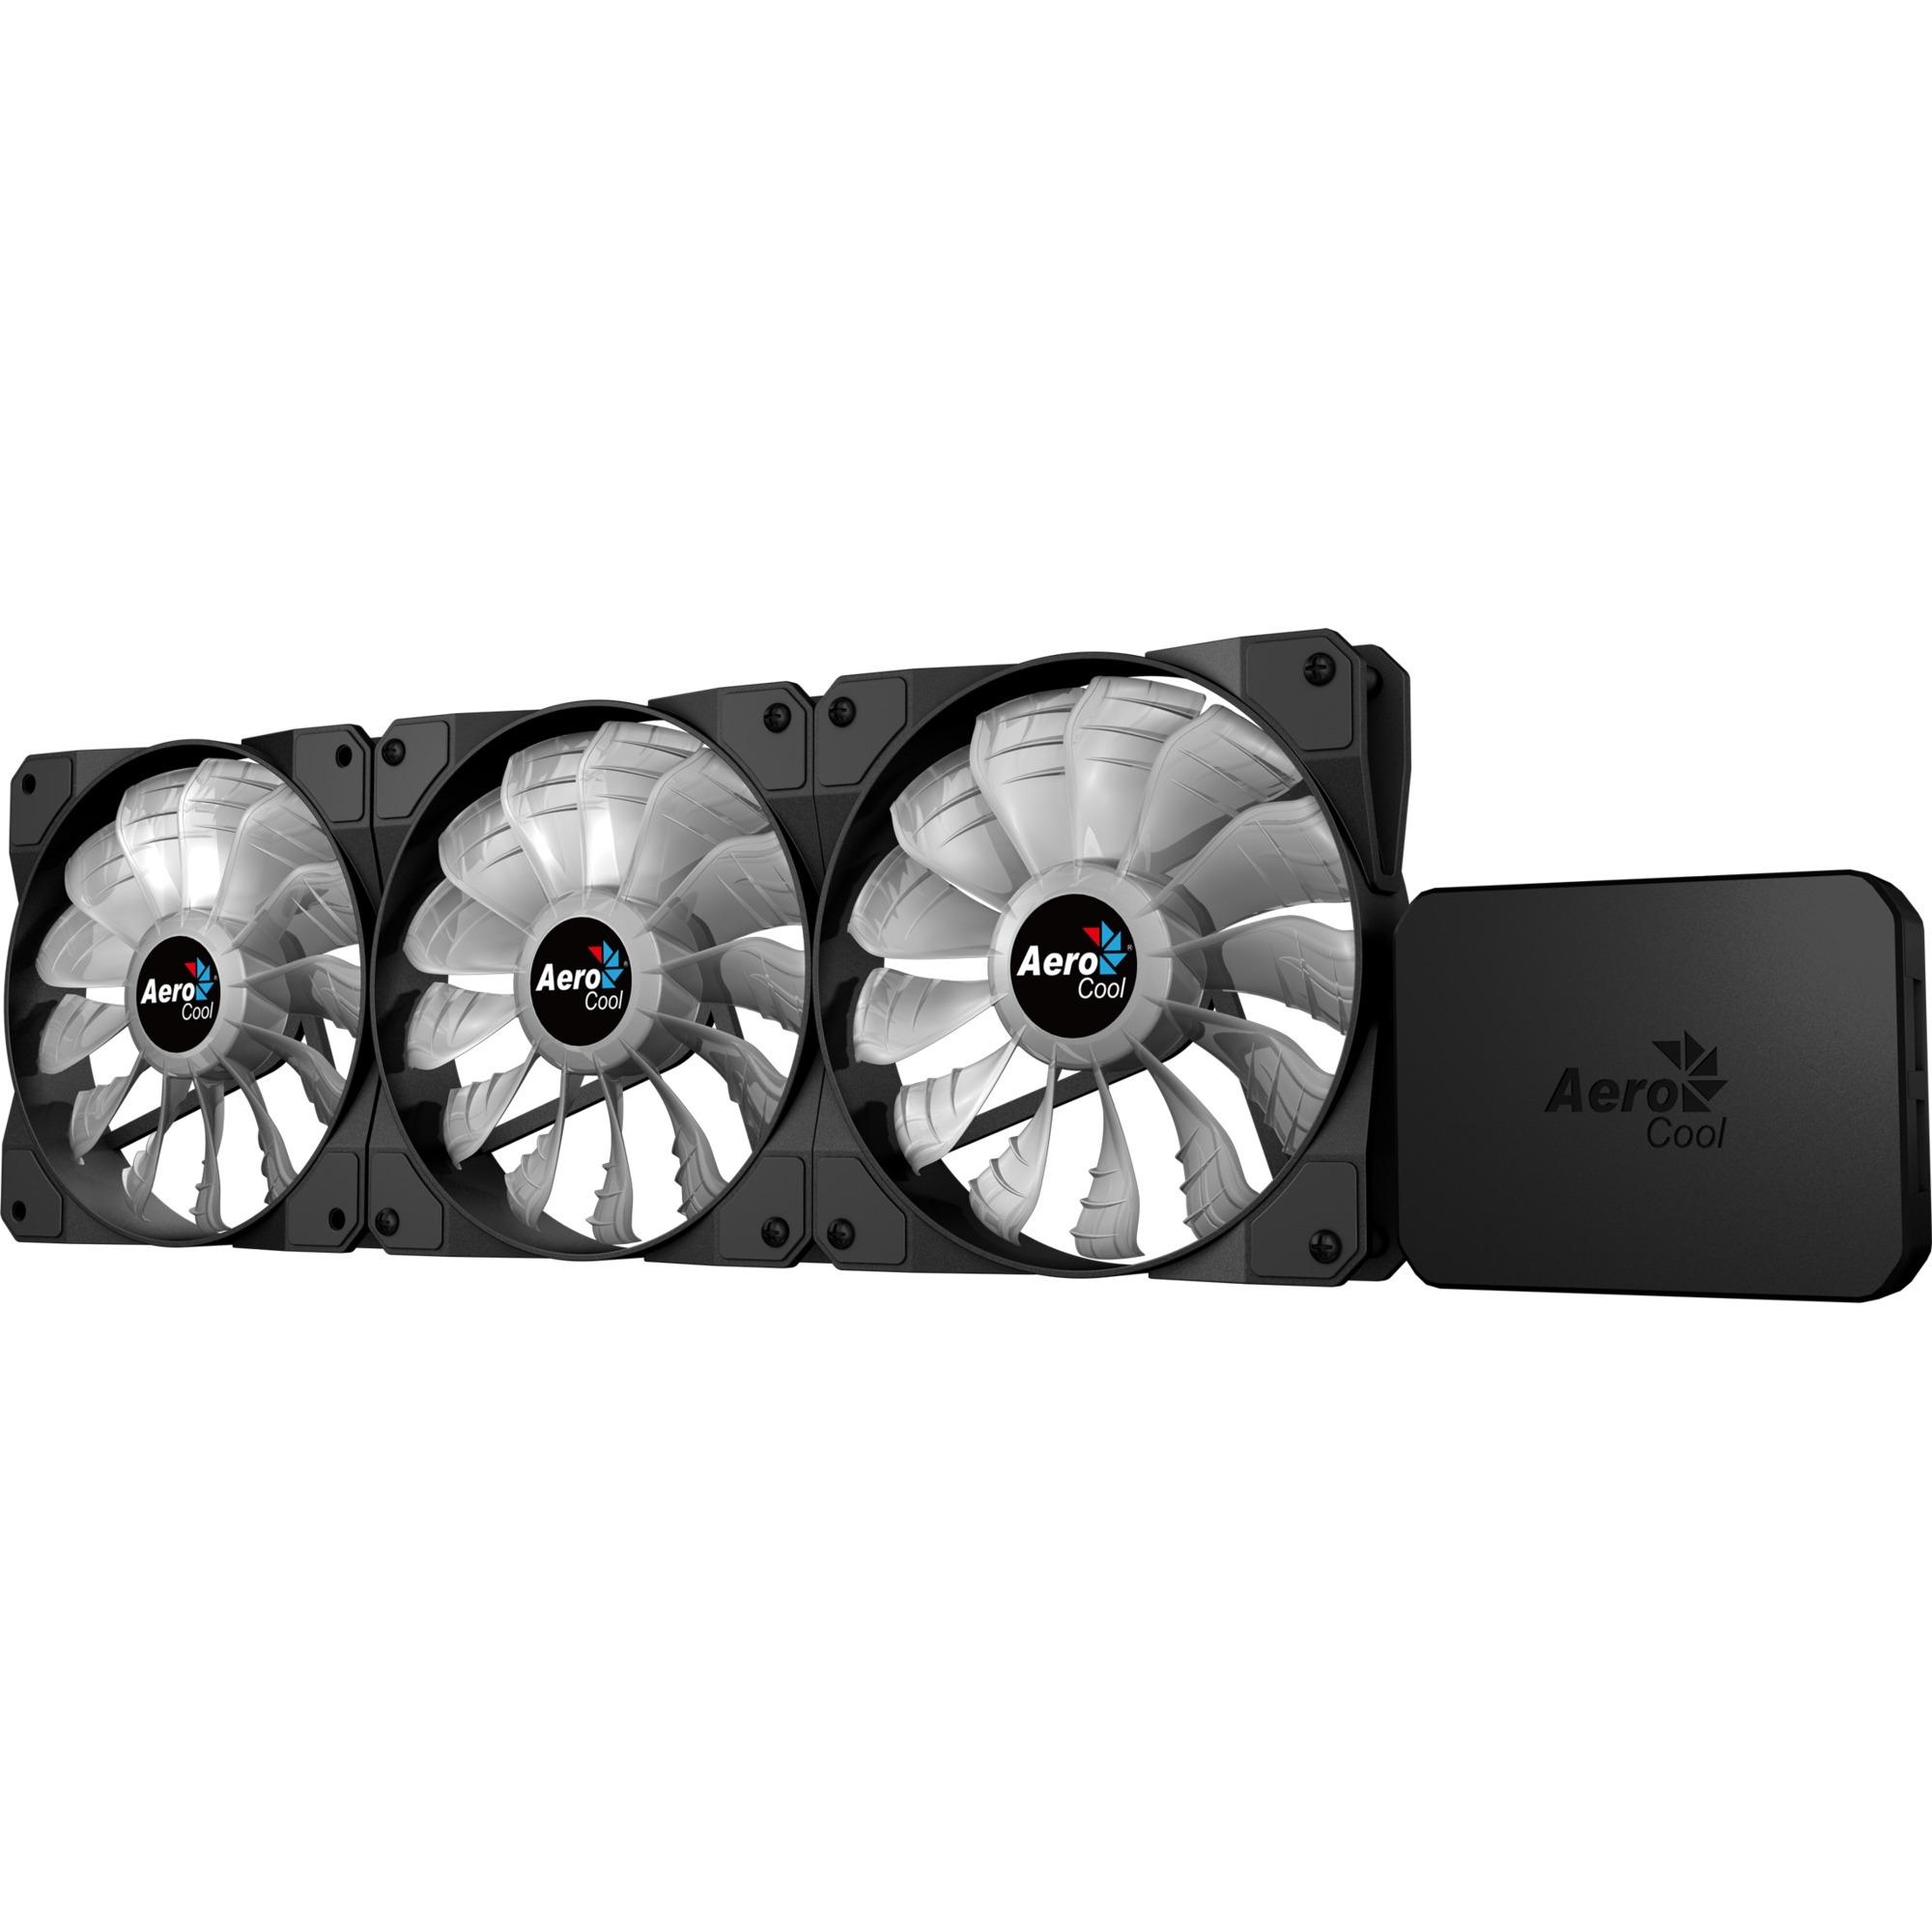 p7-f12-pro-computer-kabinet-ventilator-sag-fan